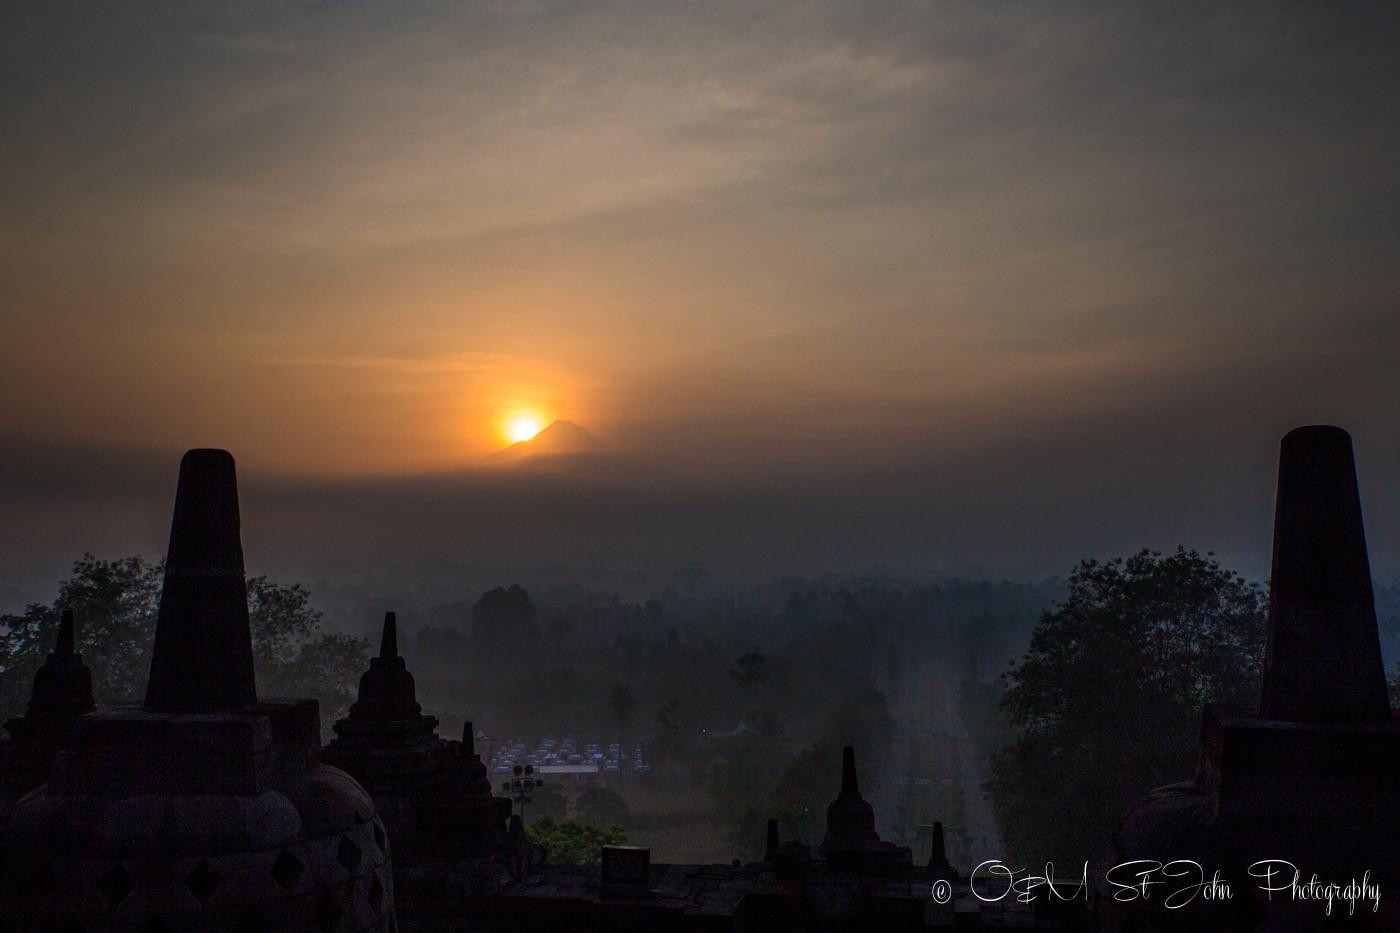 First light at Borobudur, Central Java, Indonesia